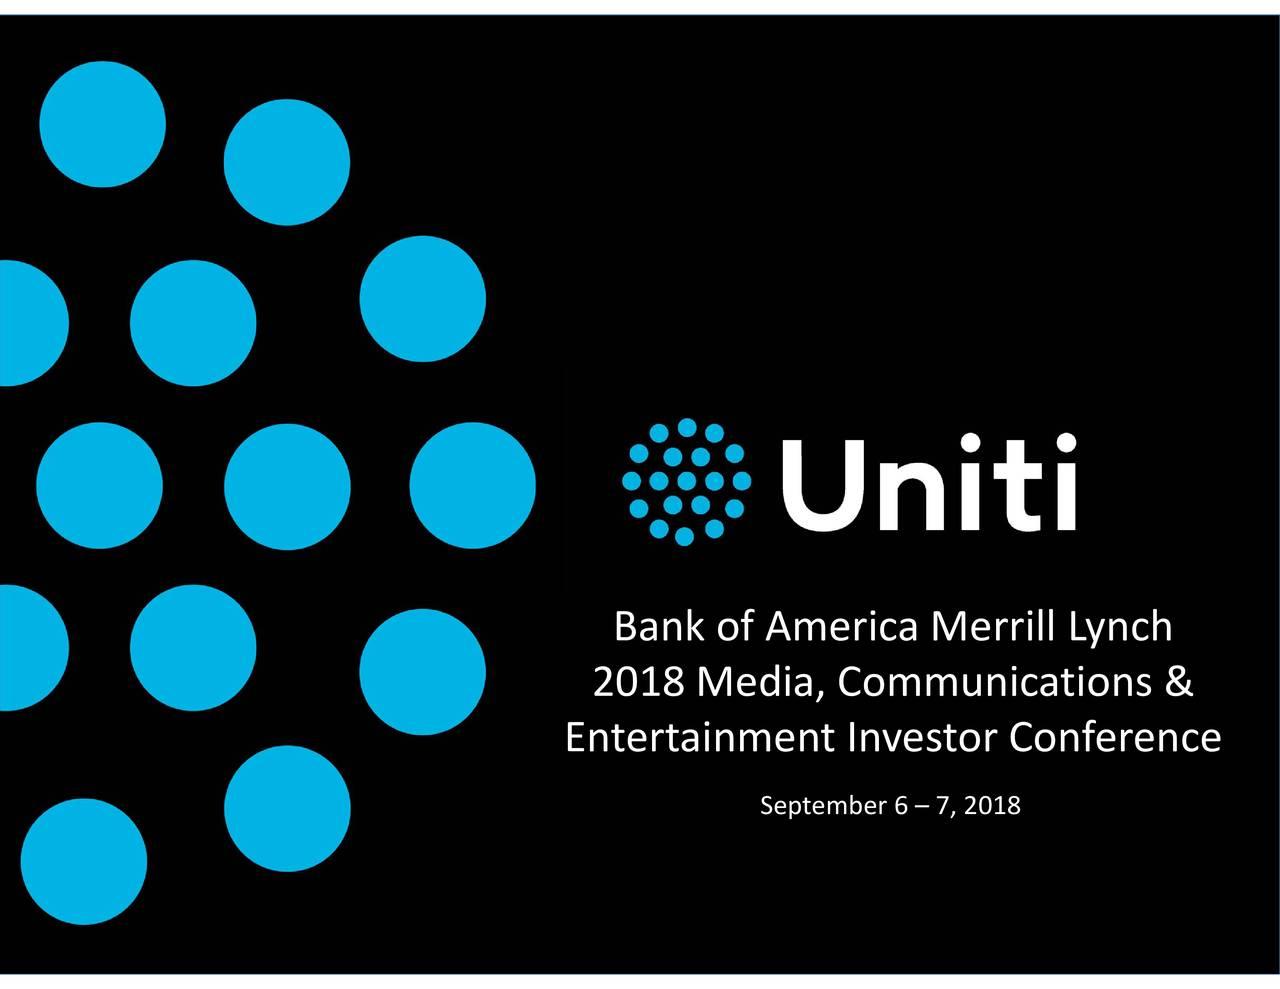 Uniti Group (UNIT) Presents At Bank Of America Merrill Lynch